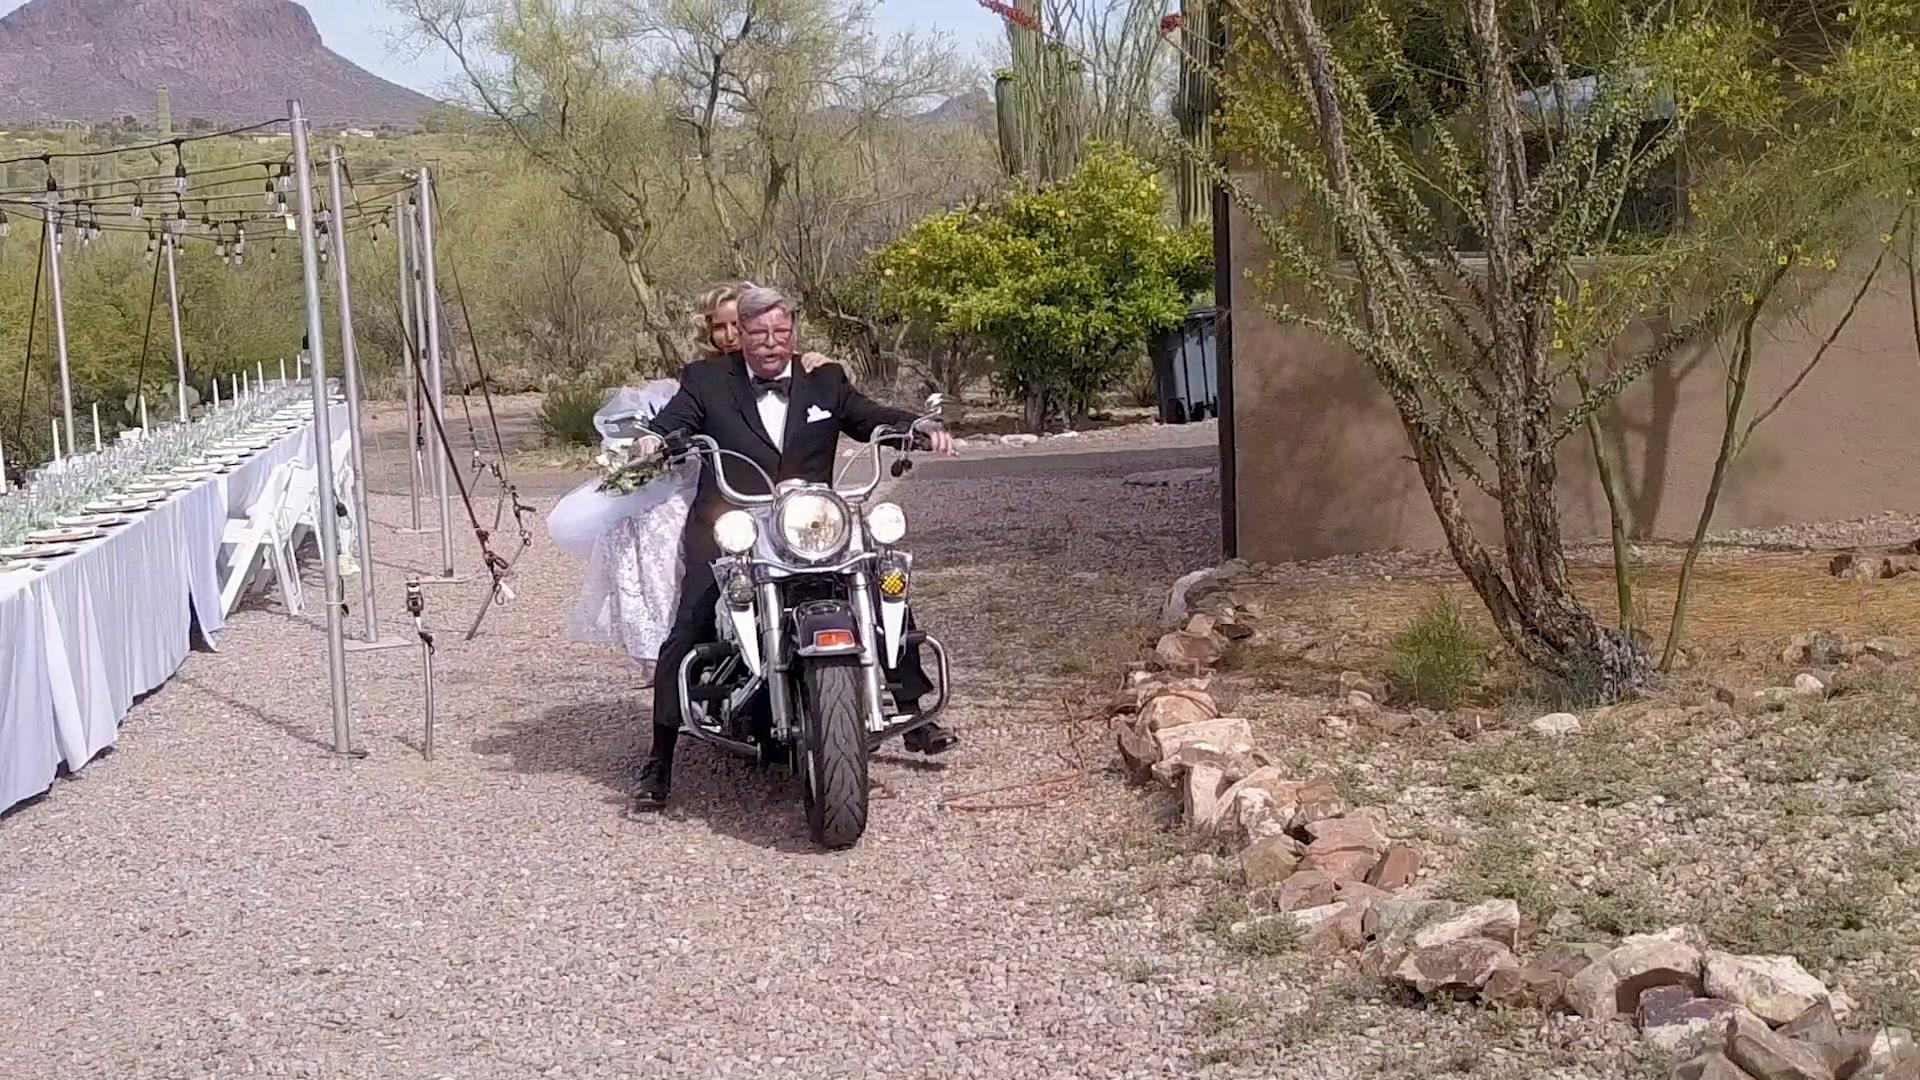 Cailey + Brendan | Tucson, Arizona | a desert